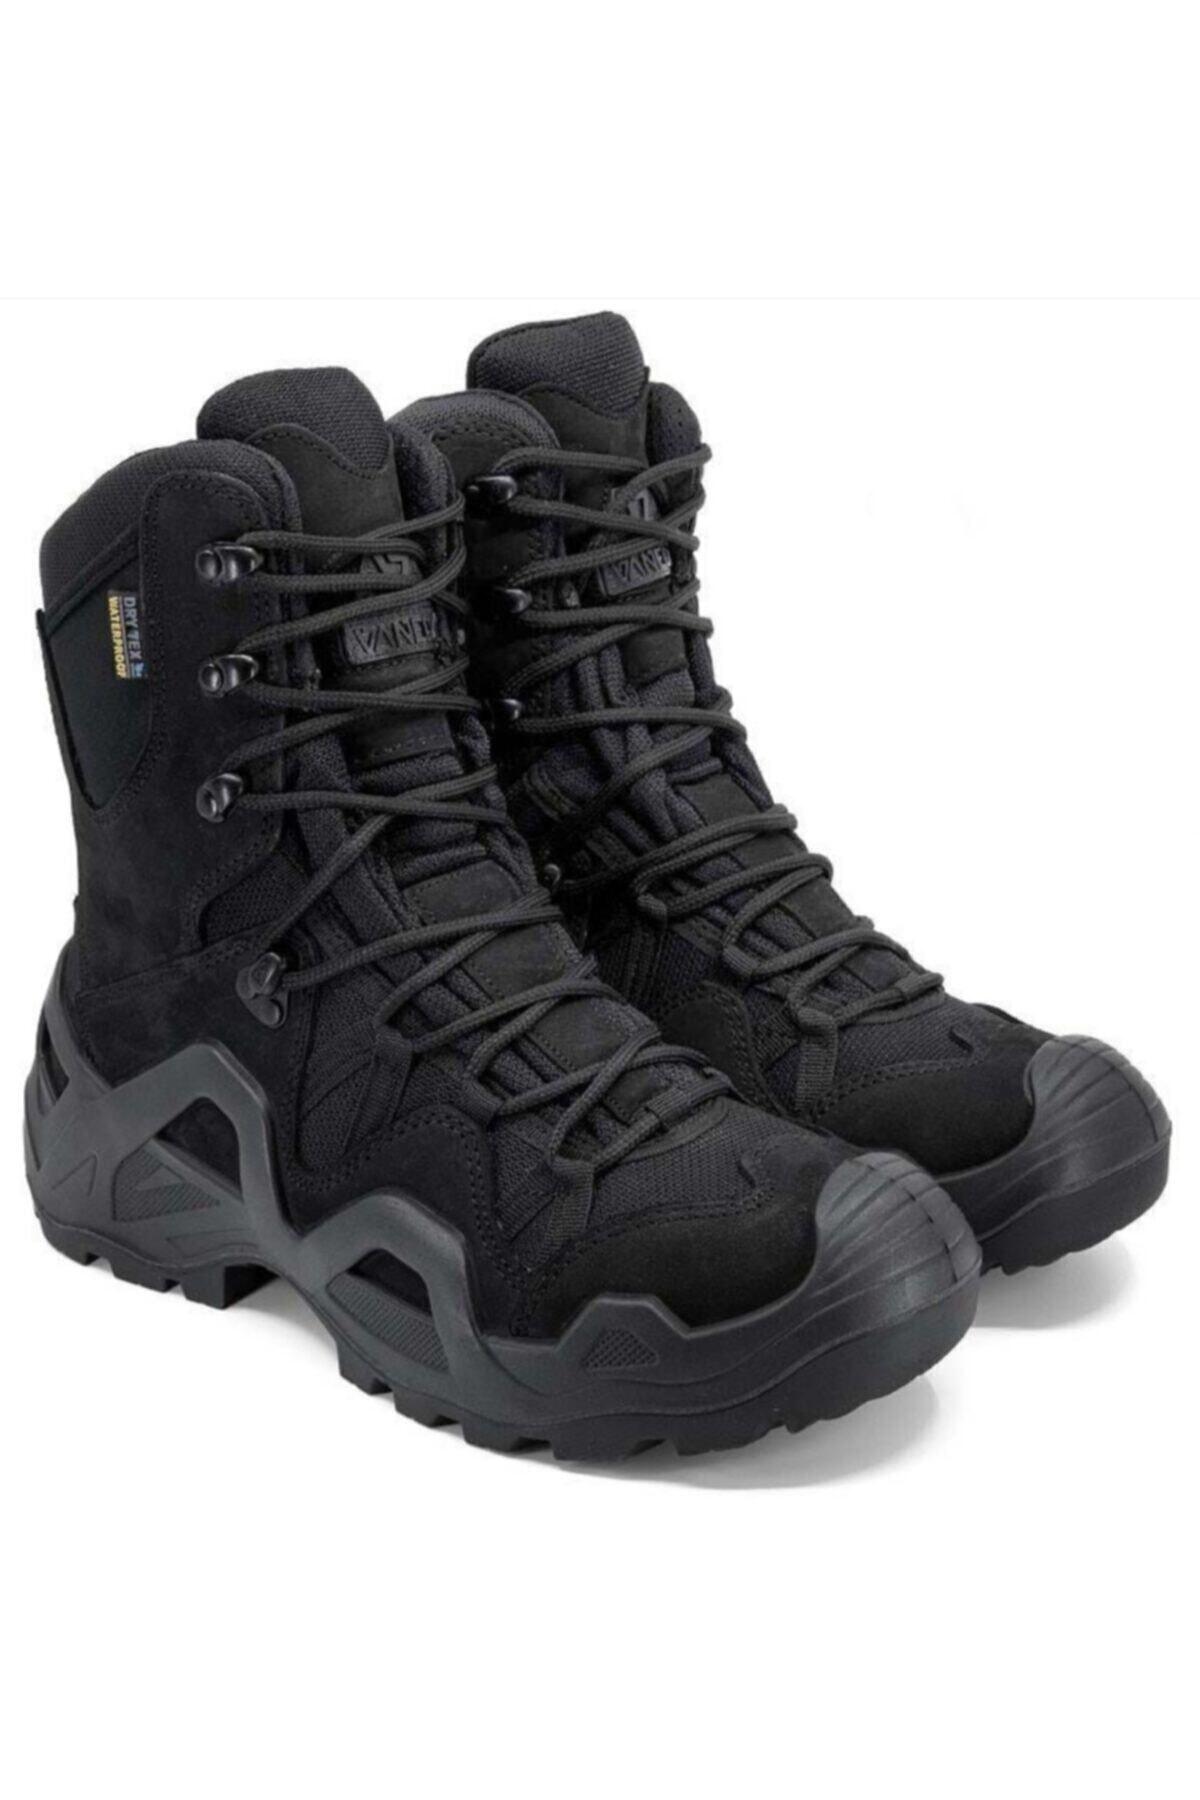 Silyon Askeri Giyim Unisex Siyah Vaneda Askeri Tip Bot 2